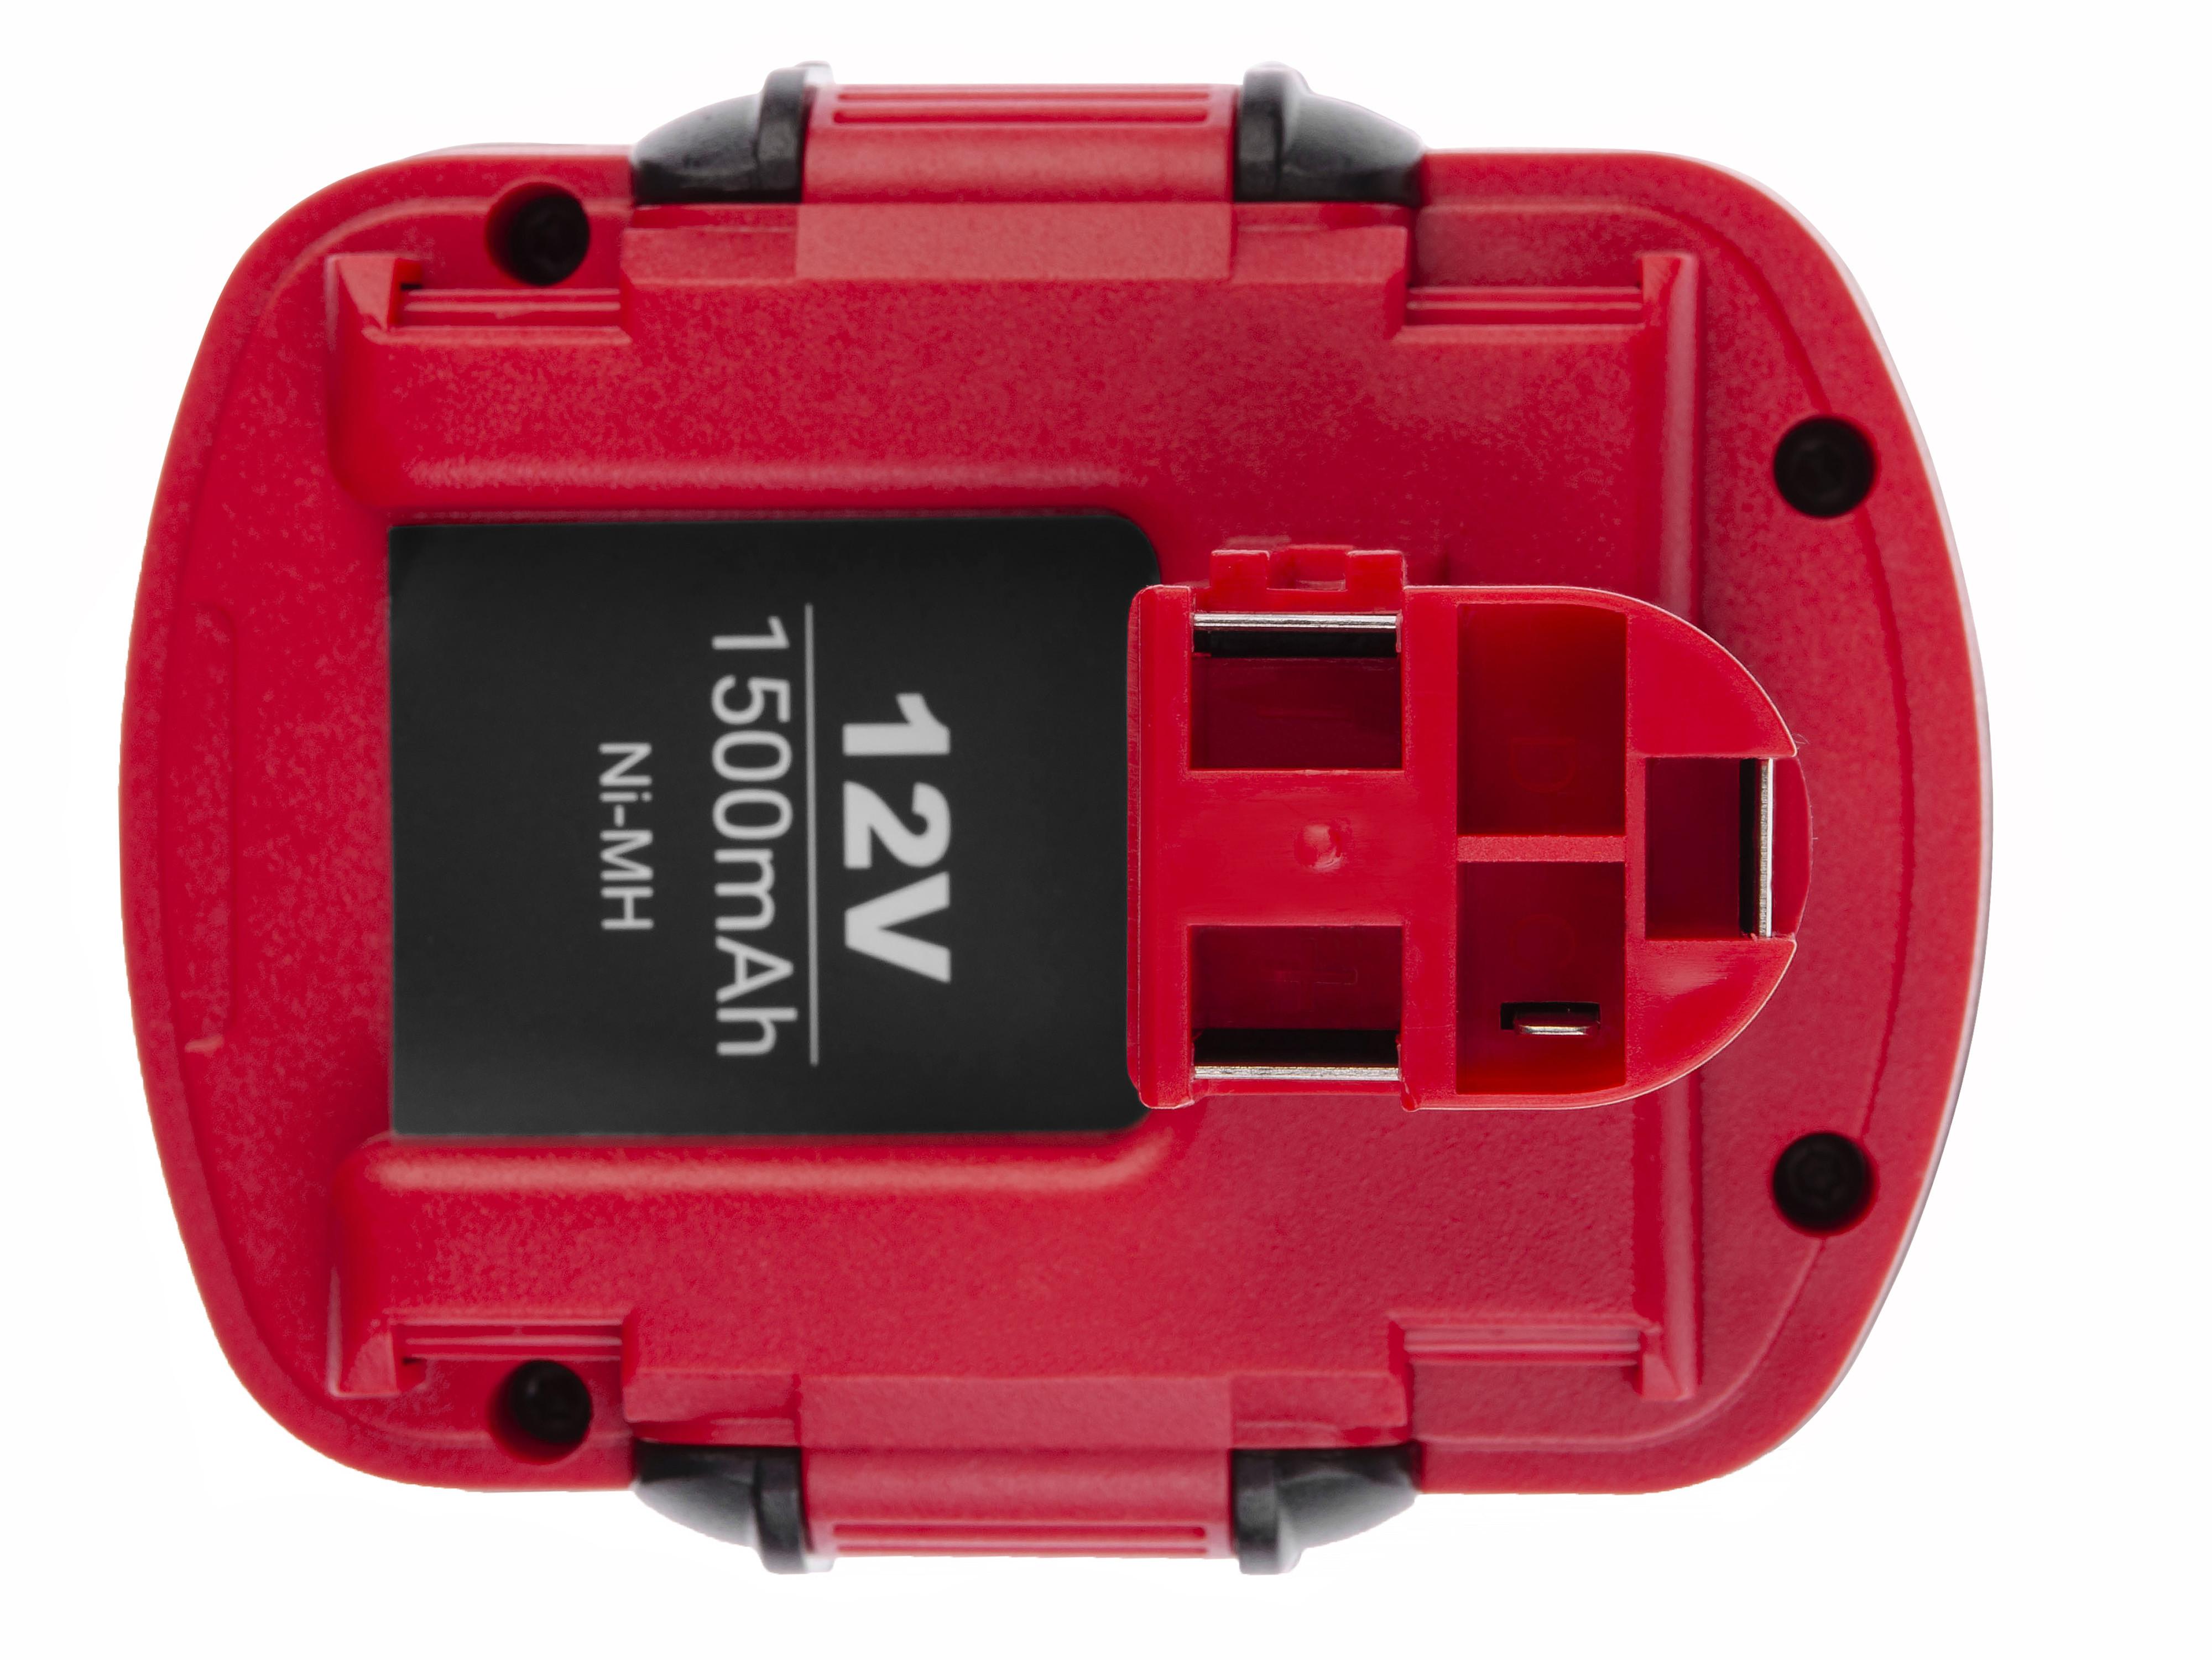 Baterie Green Cell Bosch O-Pack 3300K PSR 12VE-2 GSB 12 VSE-2 12V 1500mAh Ni-MH – neoriginální